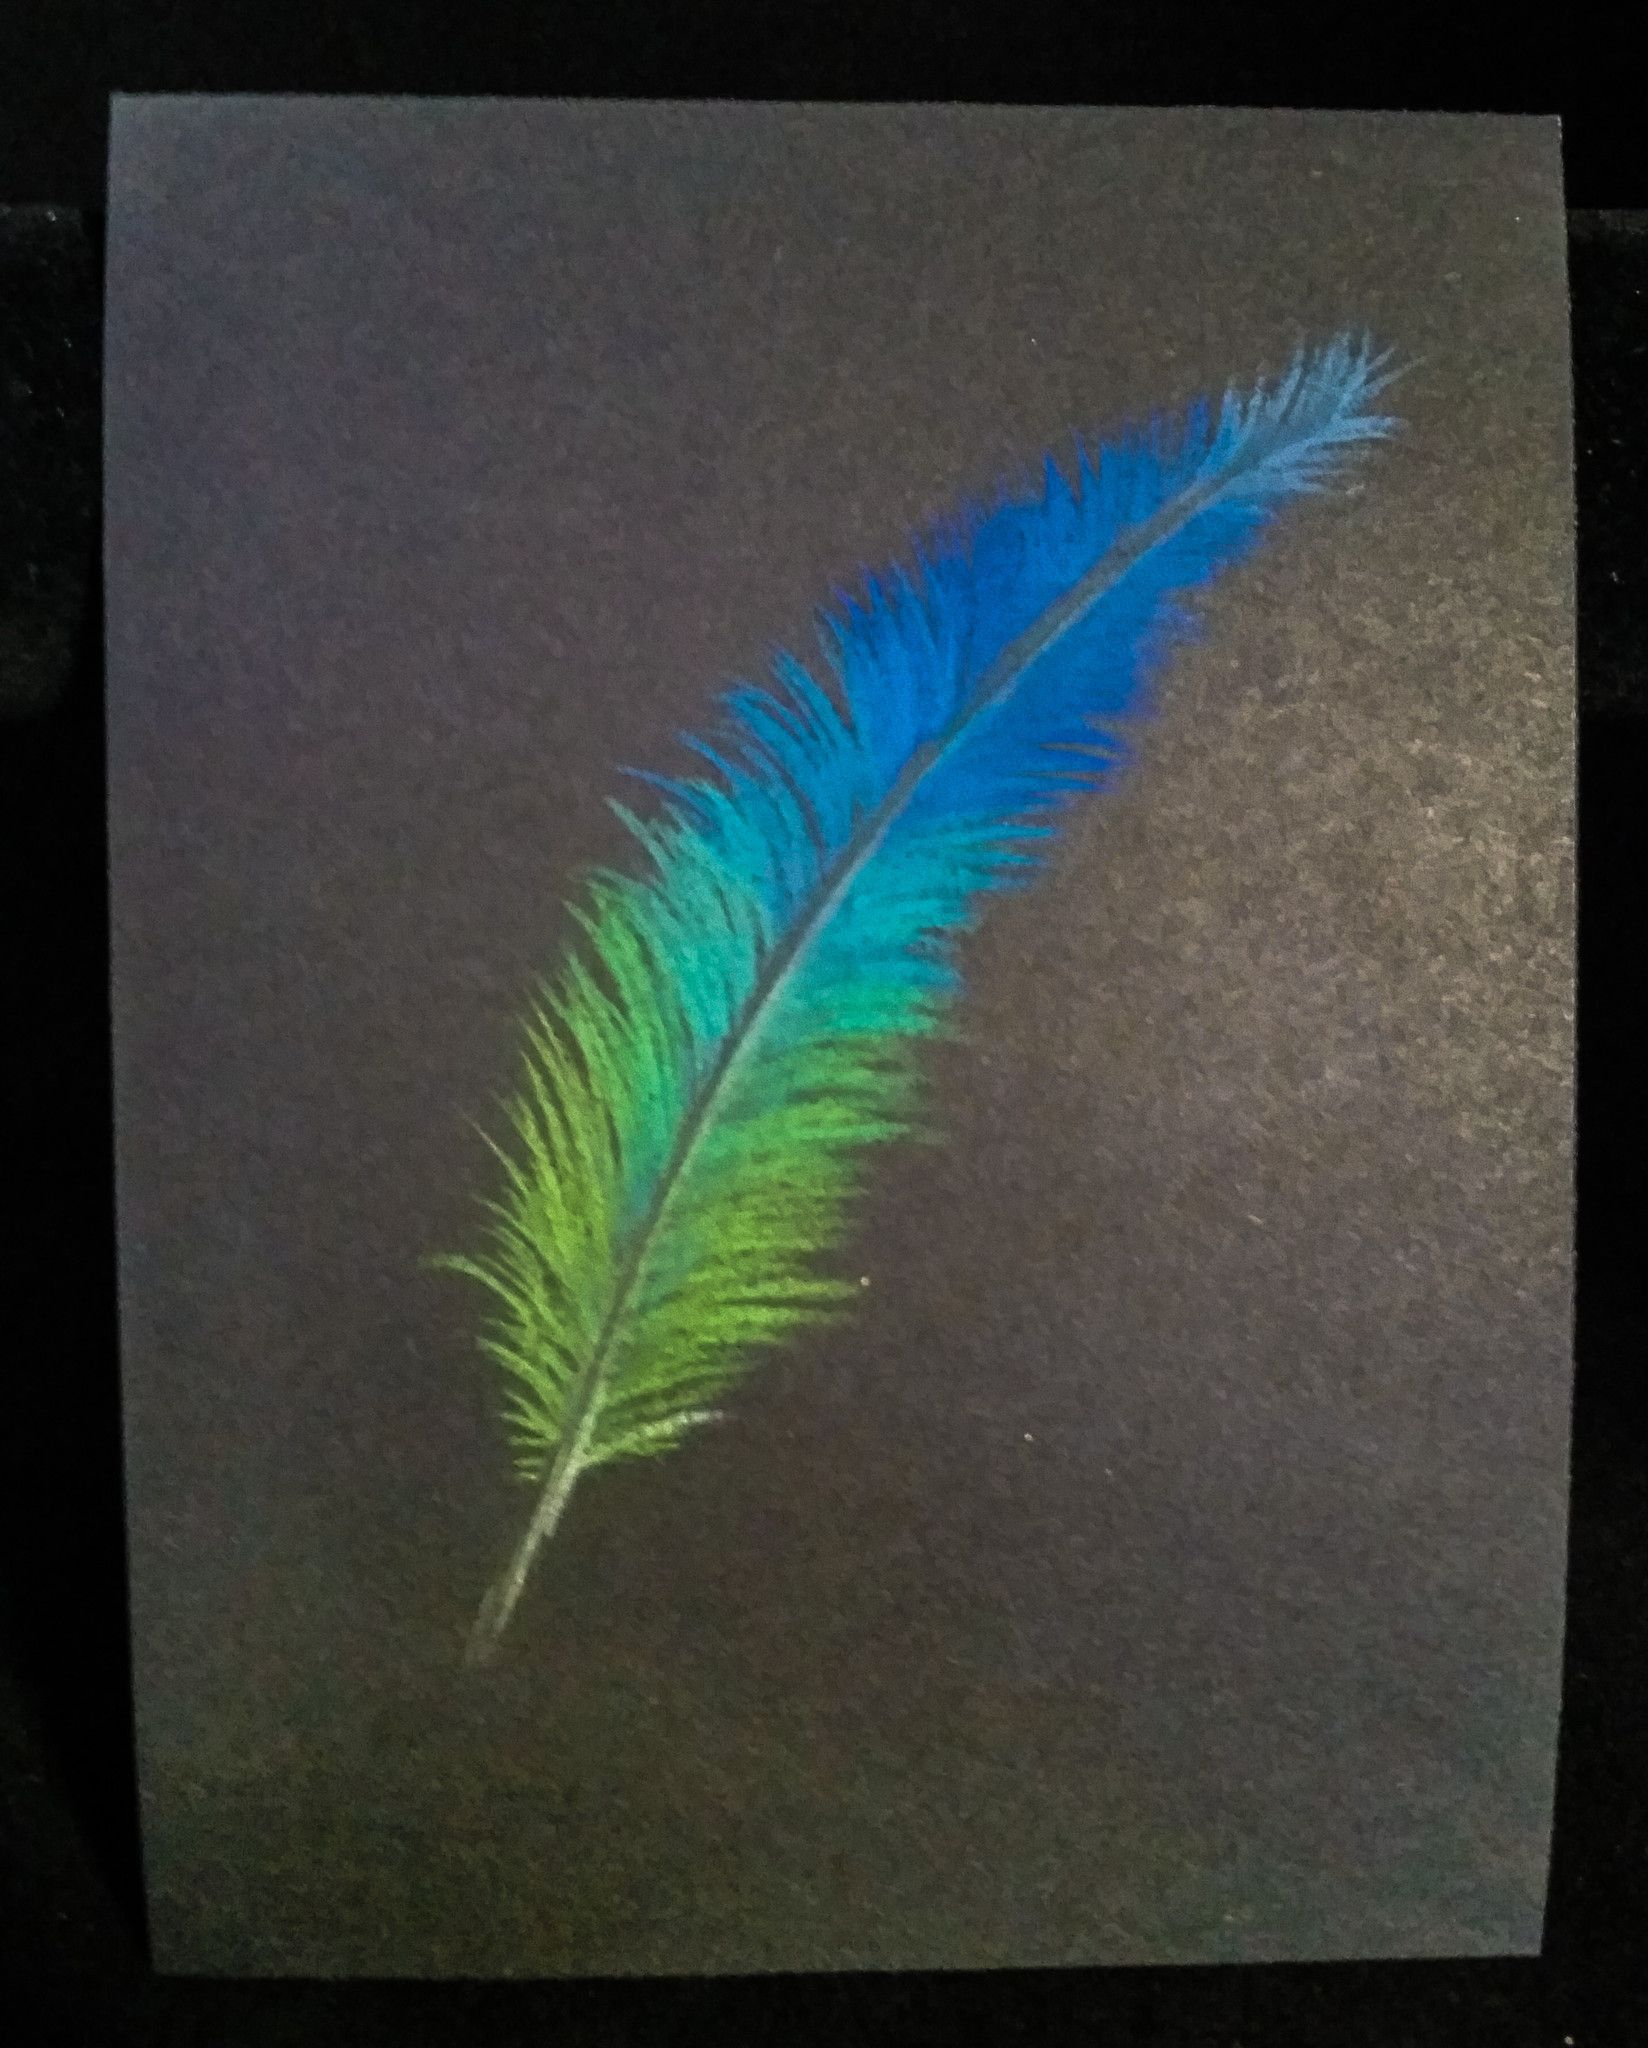 feather sketch pastel on black black paper pastels